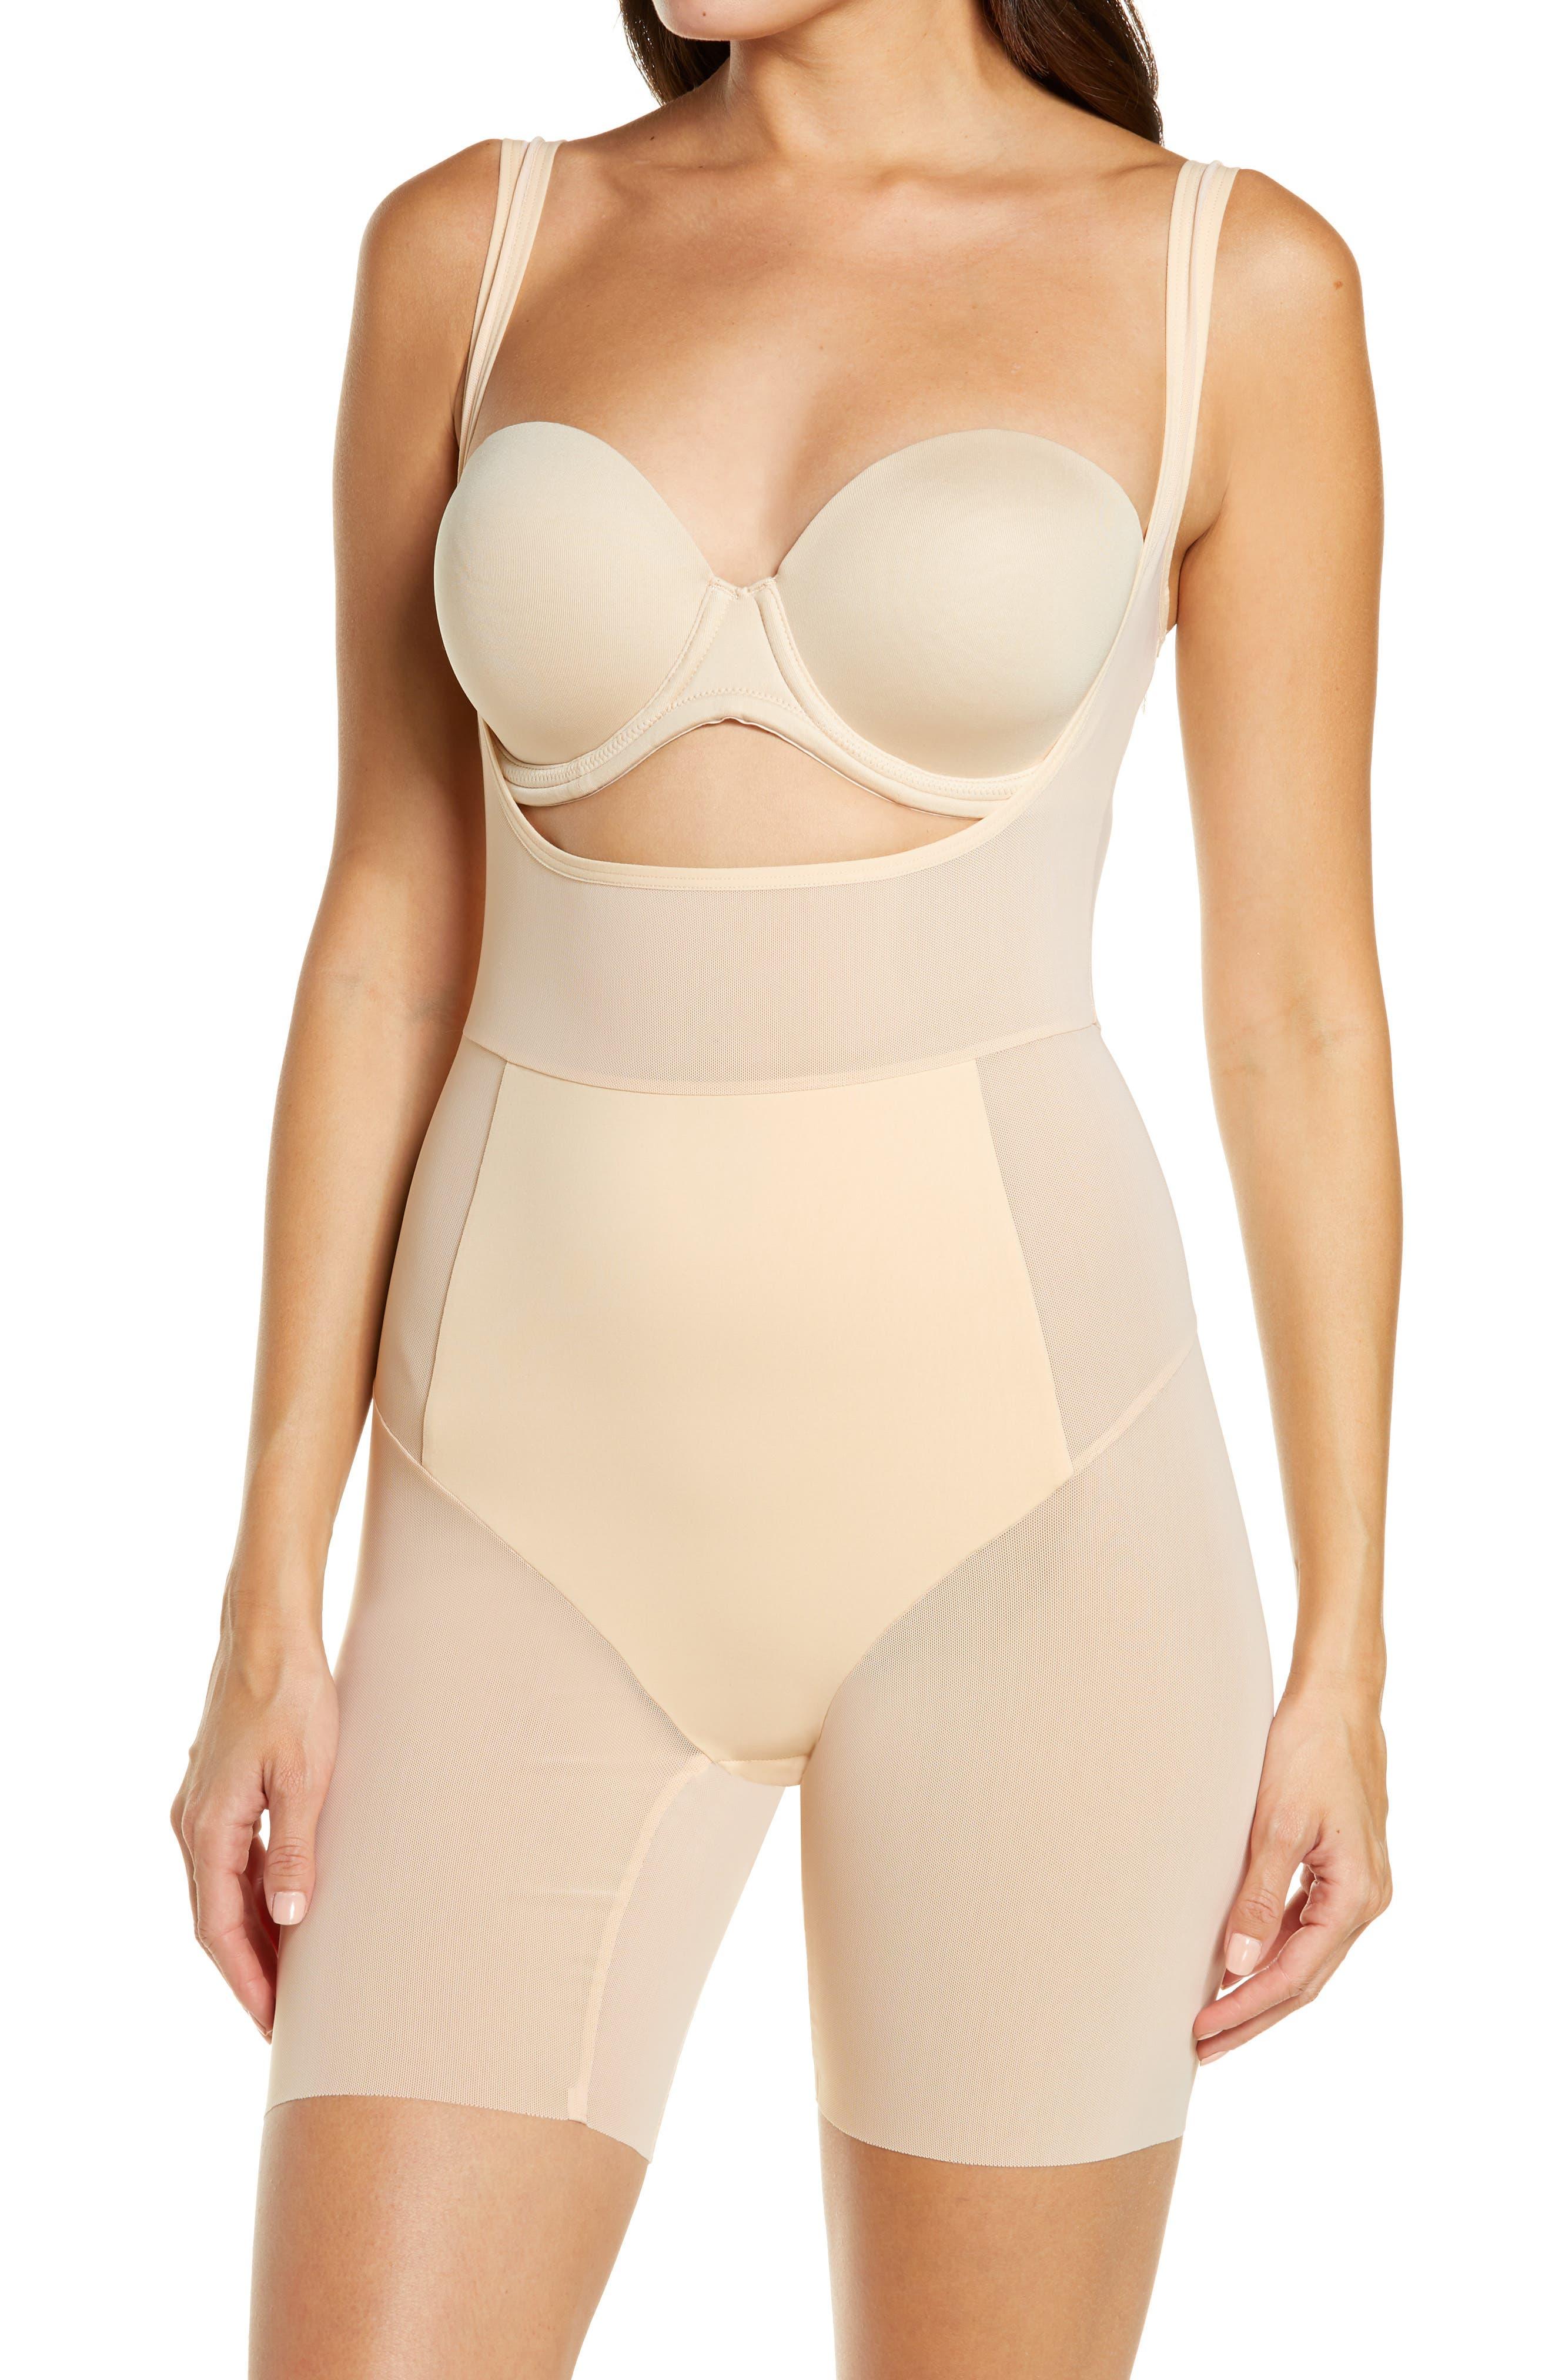 Power Mesh Open Bust Shape Bodysuit